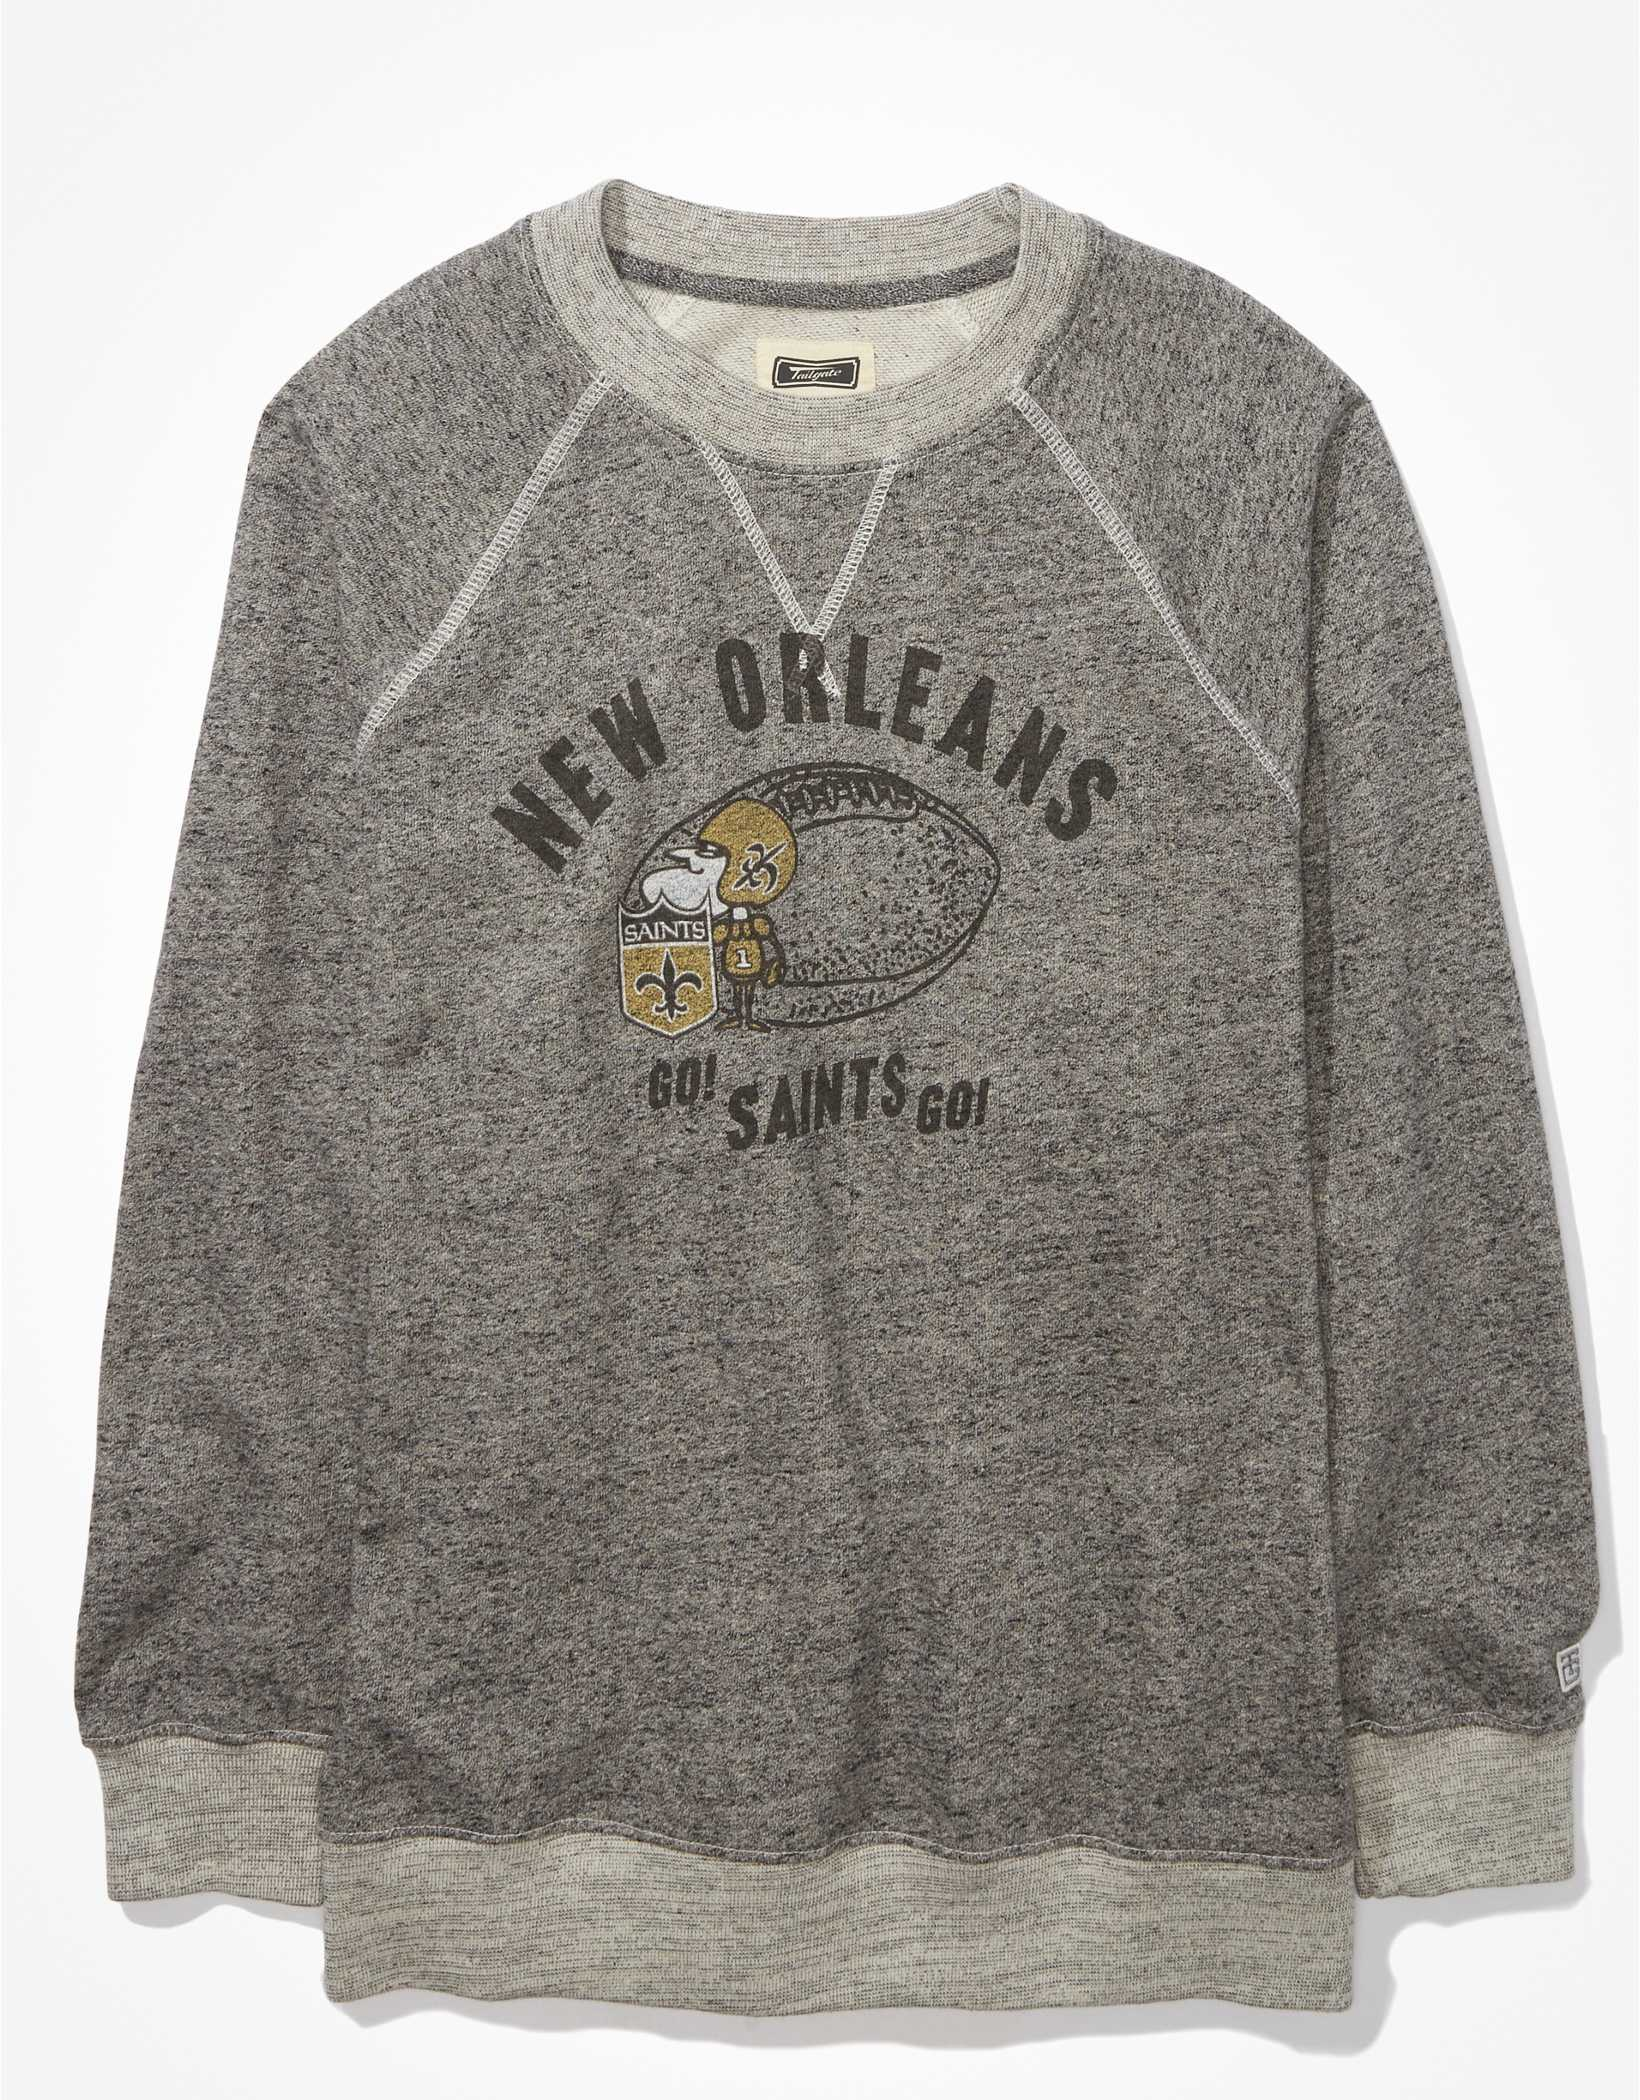 Tailgate Women's New Orleans Saints Oversized Fleece Sweatshirt